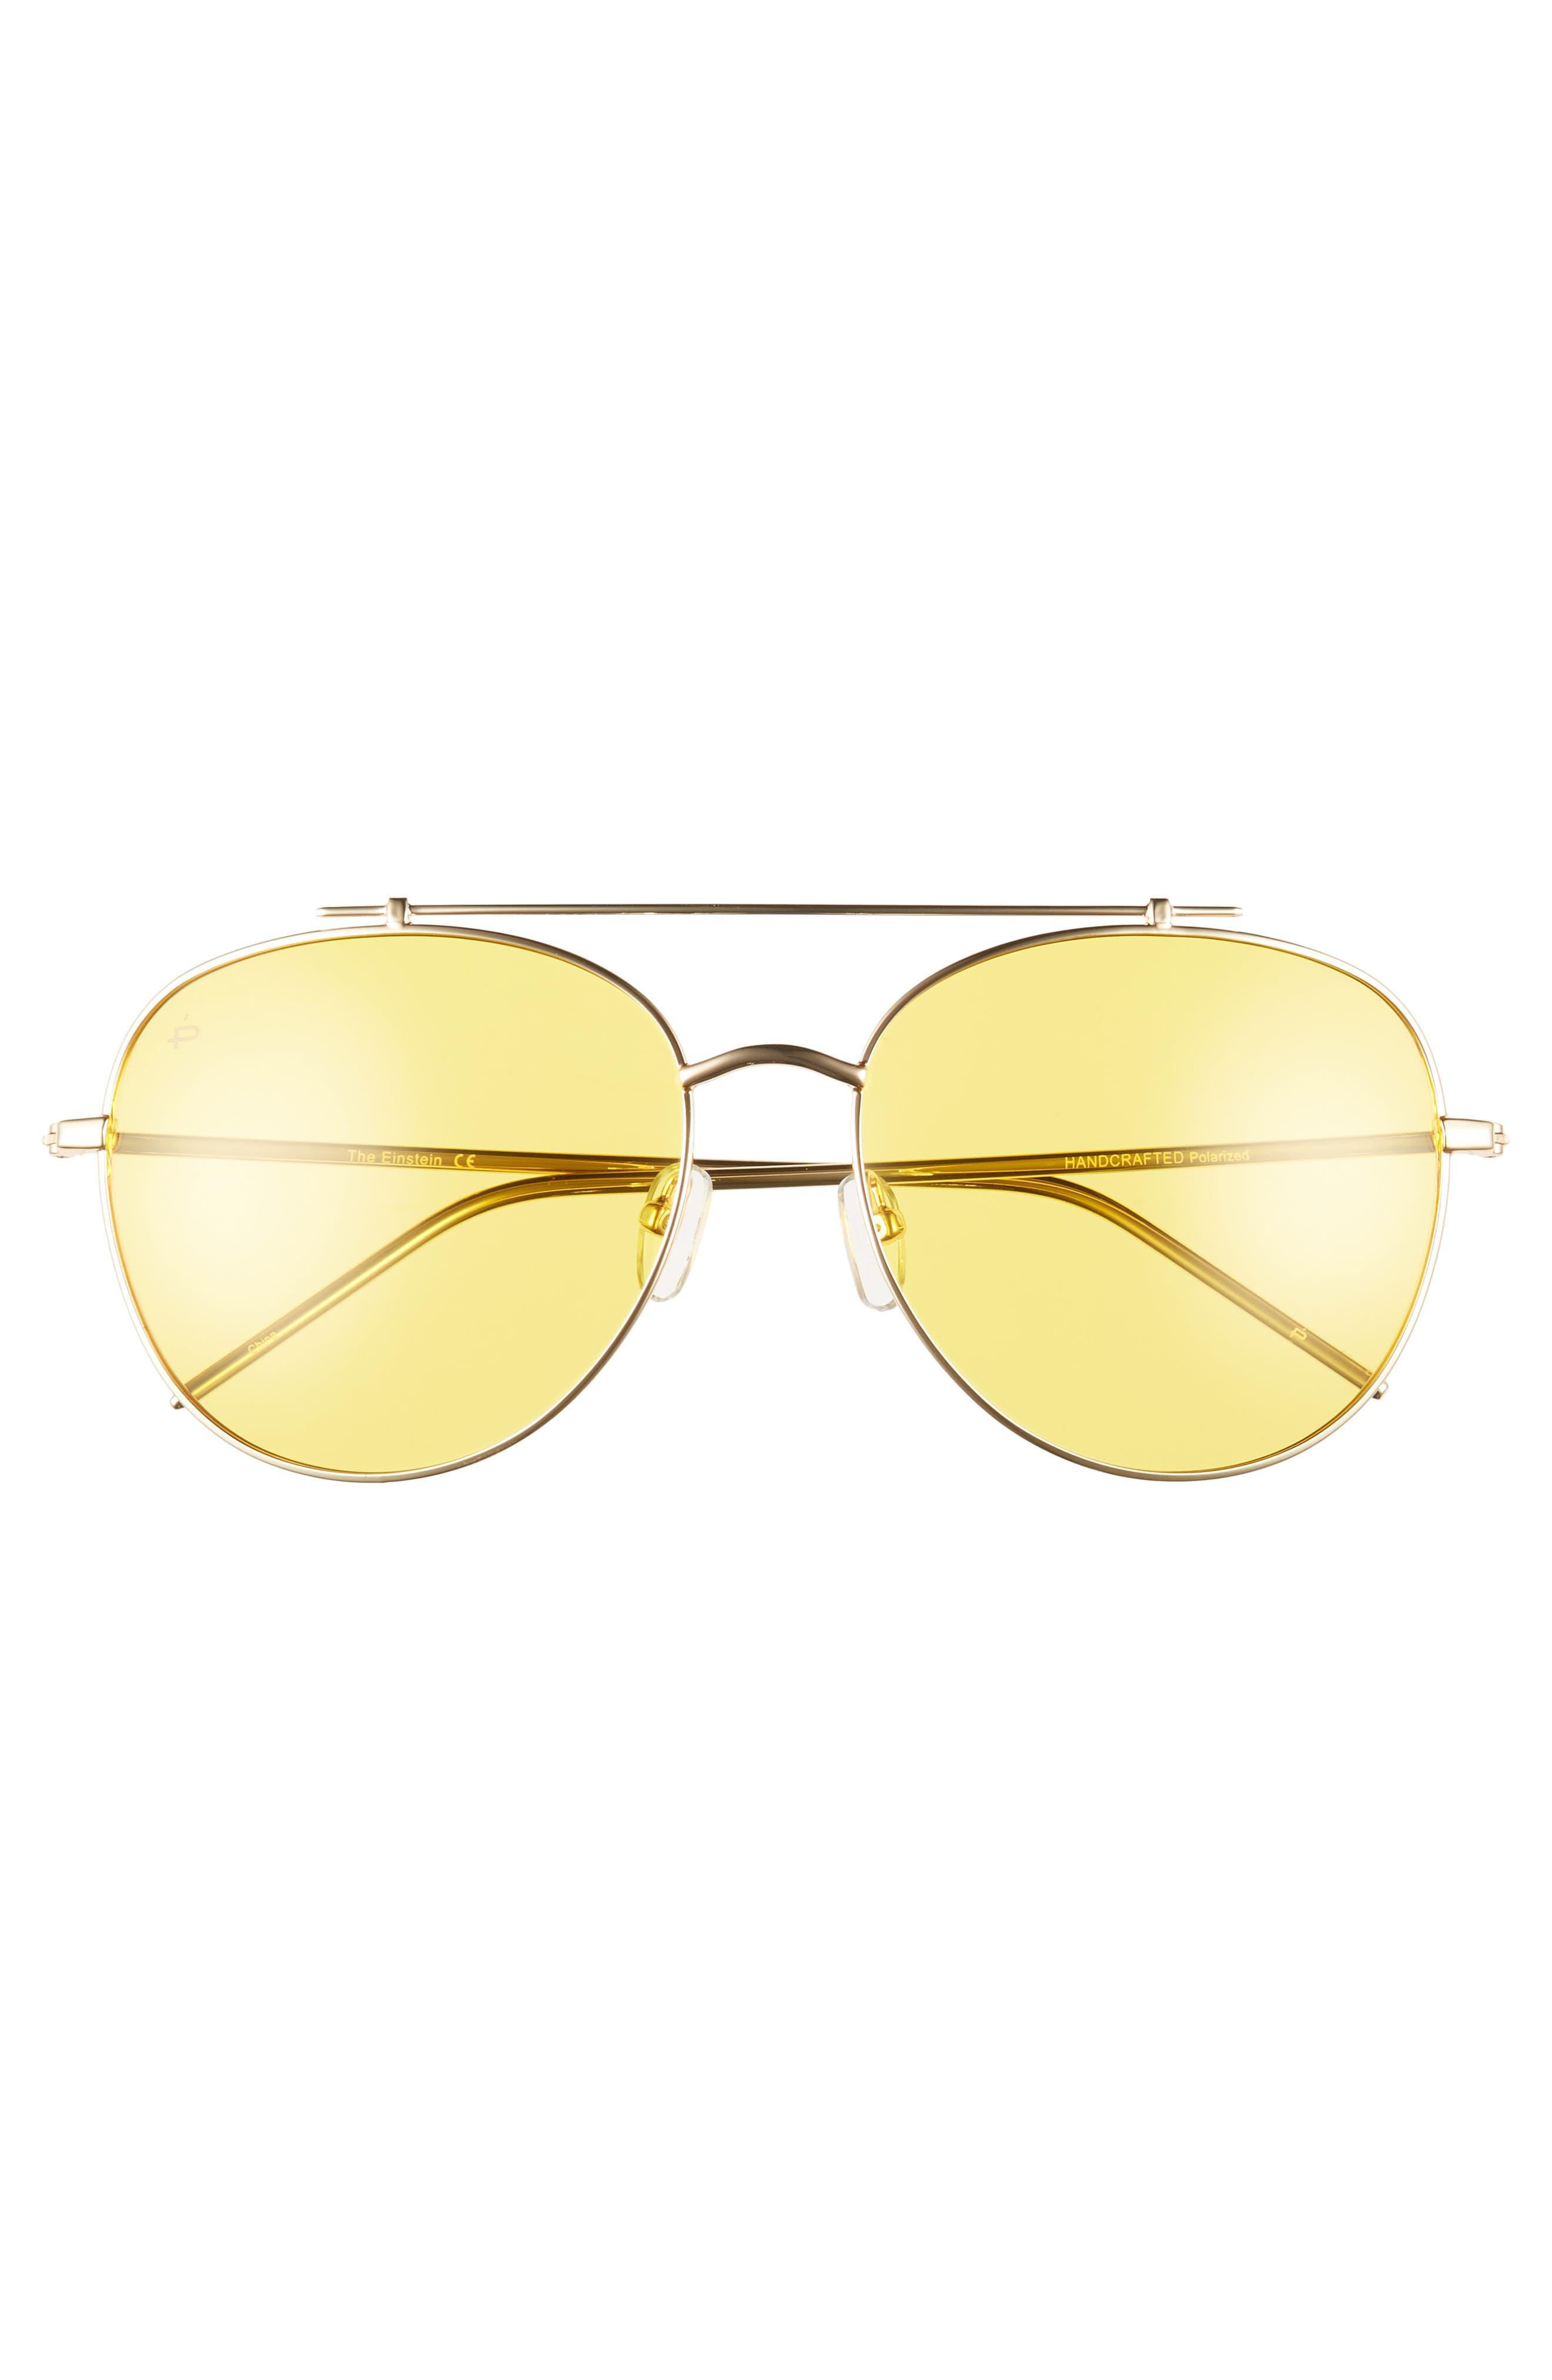 Privé Revaux The Einstein 58mm Polarized Aviator Sunglasses,                             Alternate thumbnail 2, color,                             Yellow